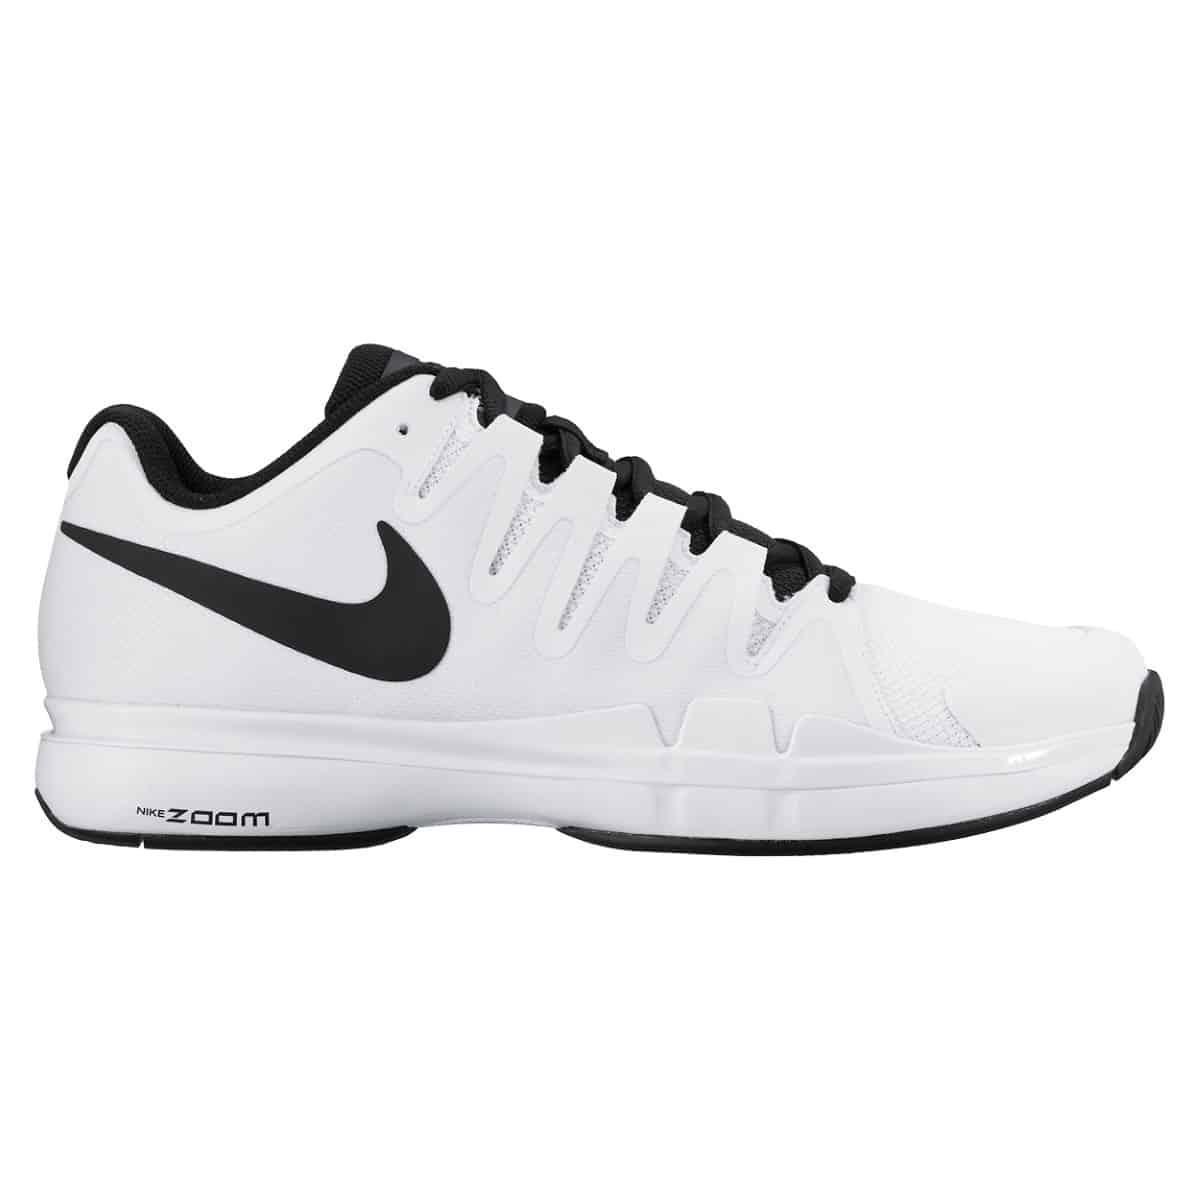 new styles dbdd7 cde6b Nike Vapor Wimbledon 2015